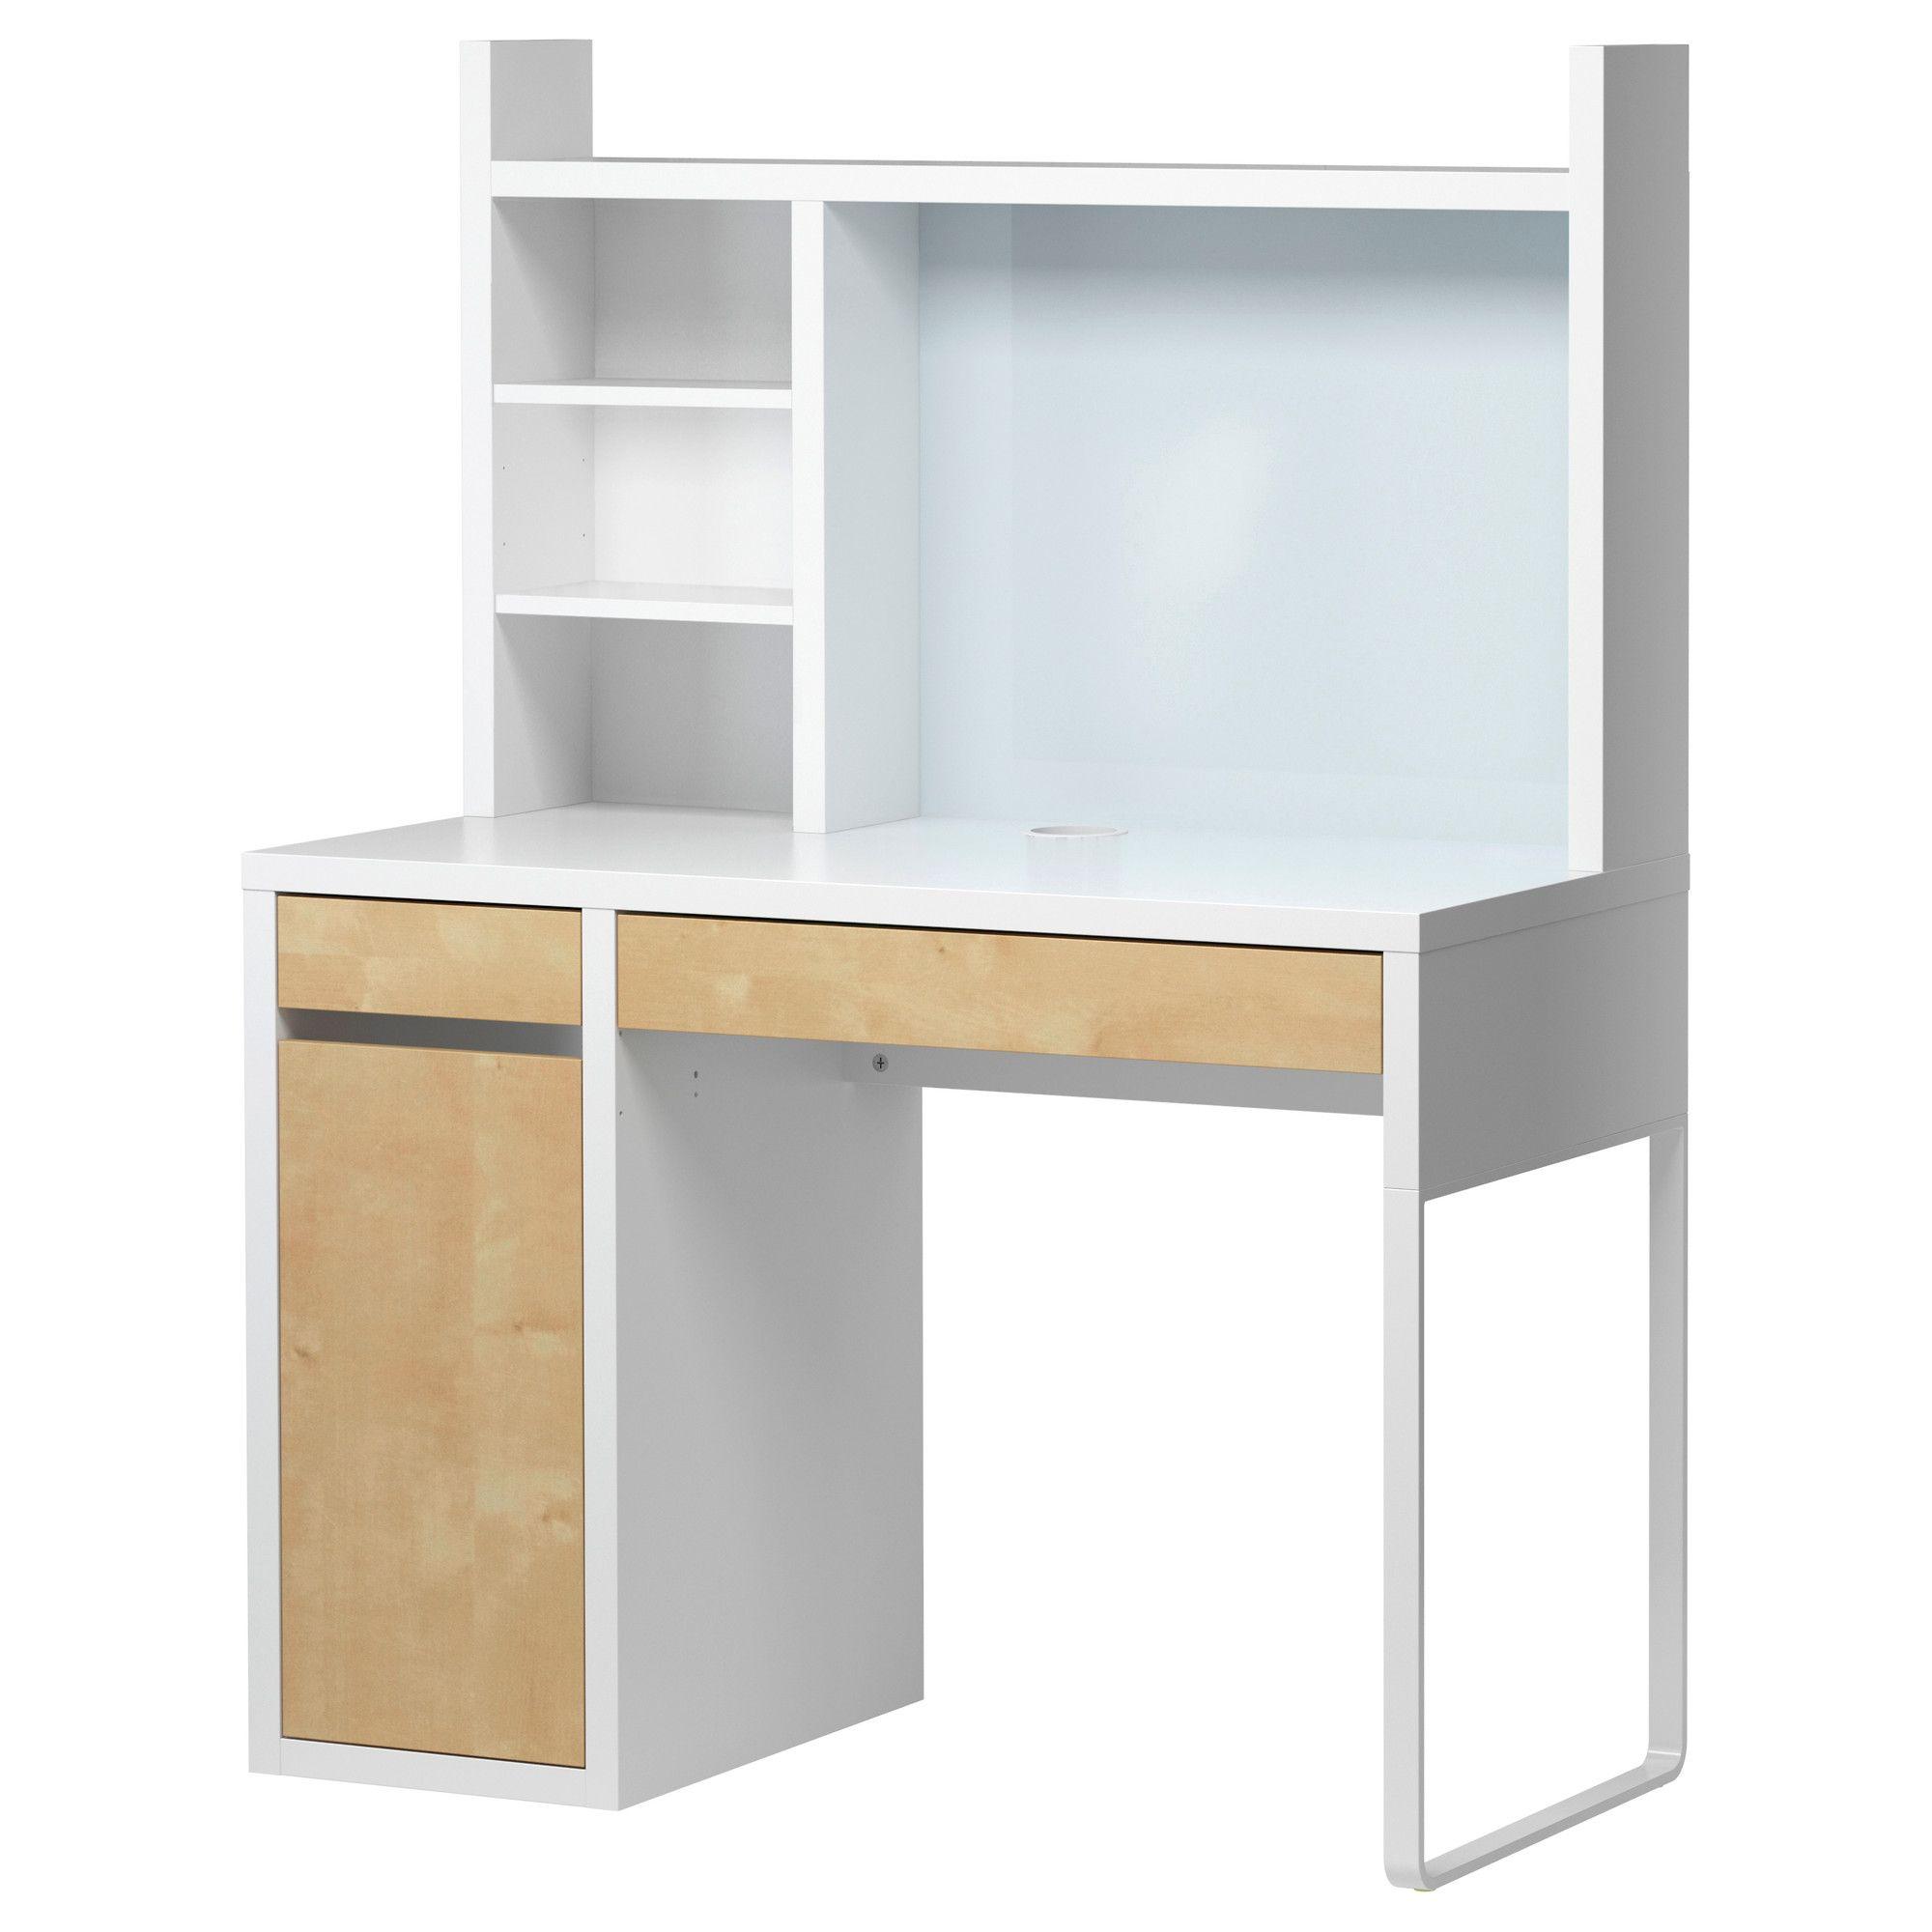 Ikea Us Furniture And Home Furnishings Ikea Computer Desk